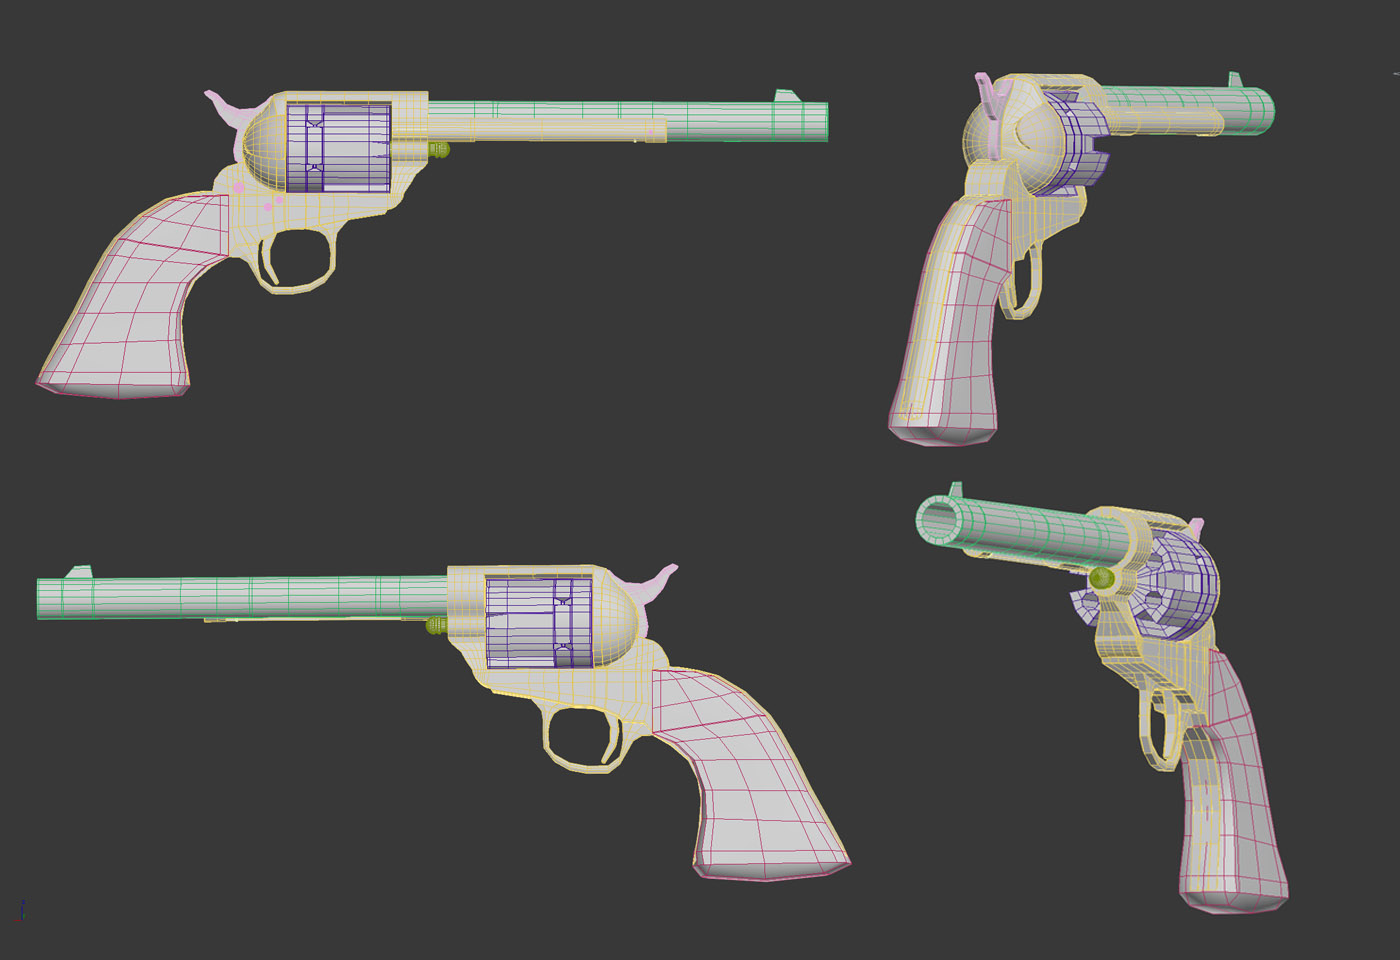 Sixshooter gun 3D model